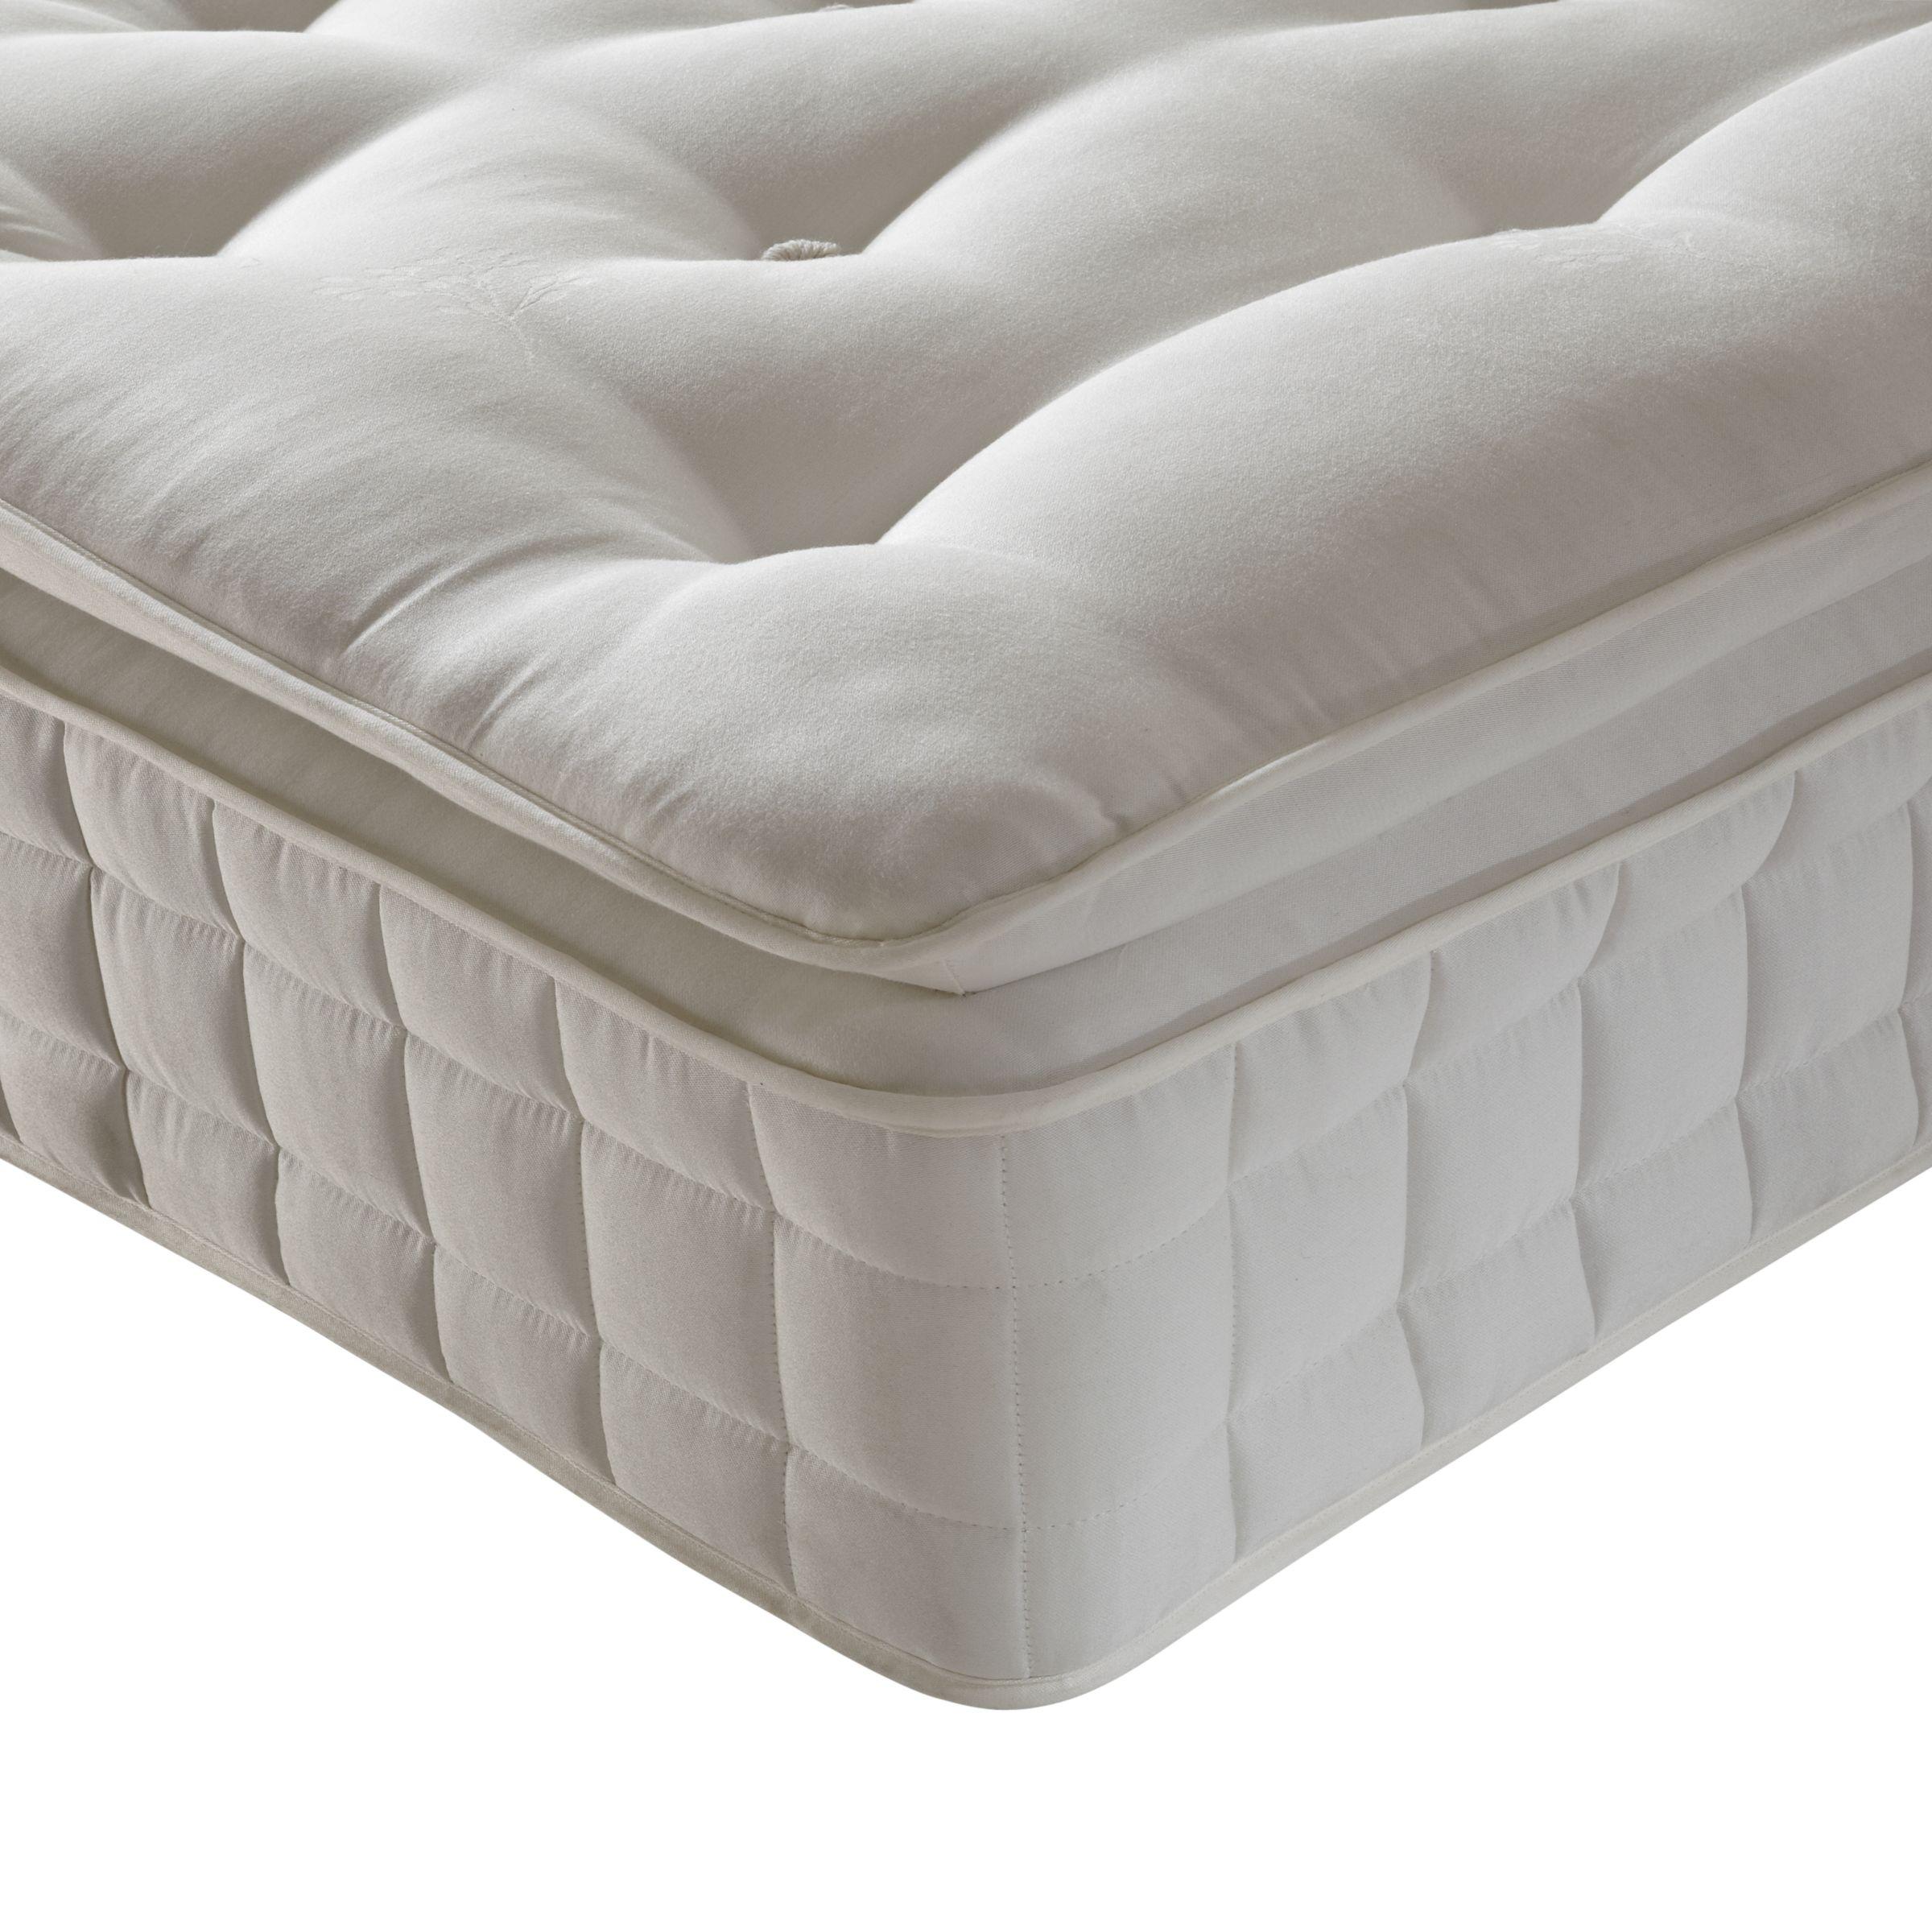 John Lewis Luxury Comfort Wool Pillowtop Mattress, Double